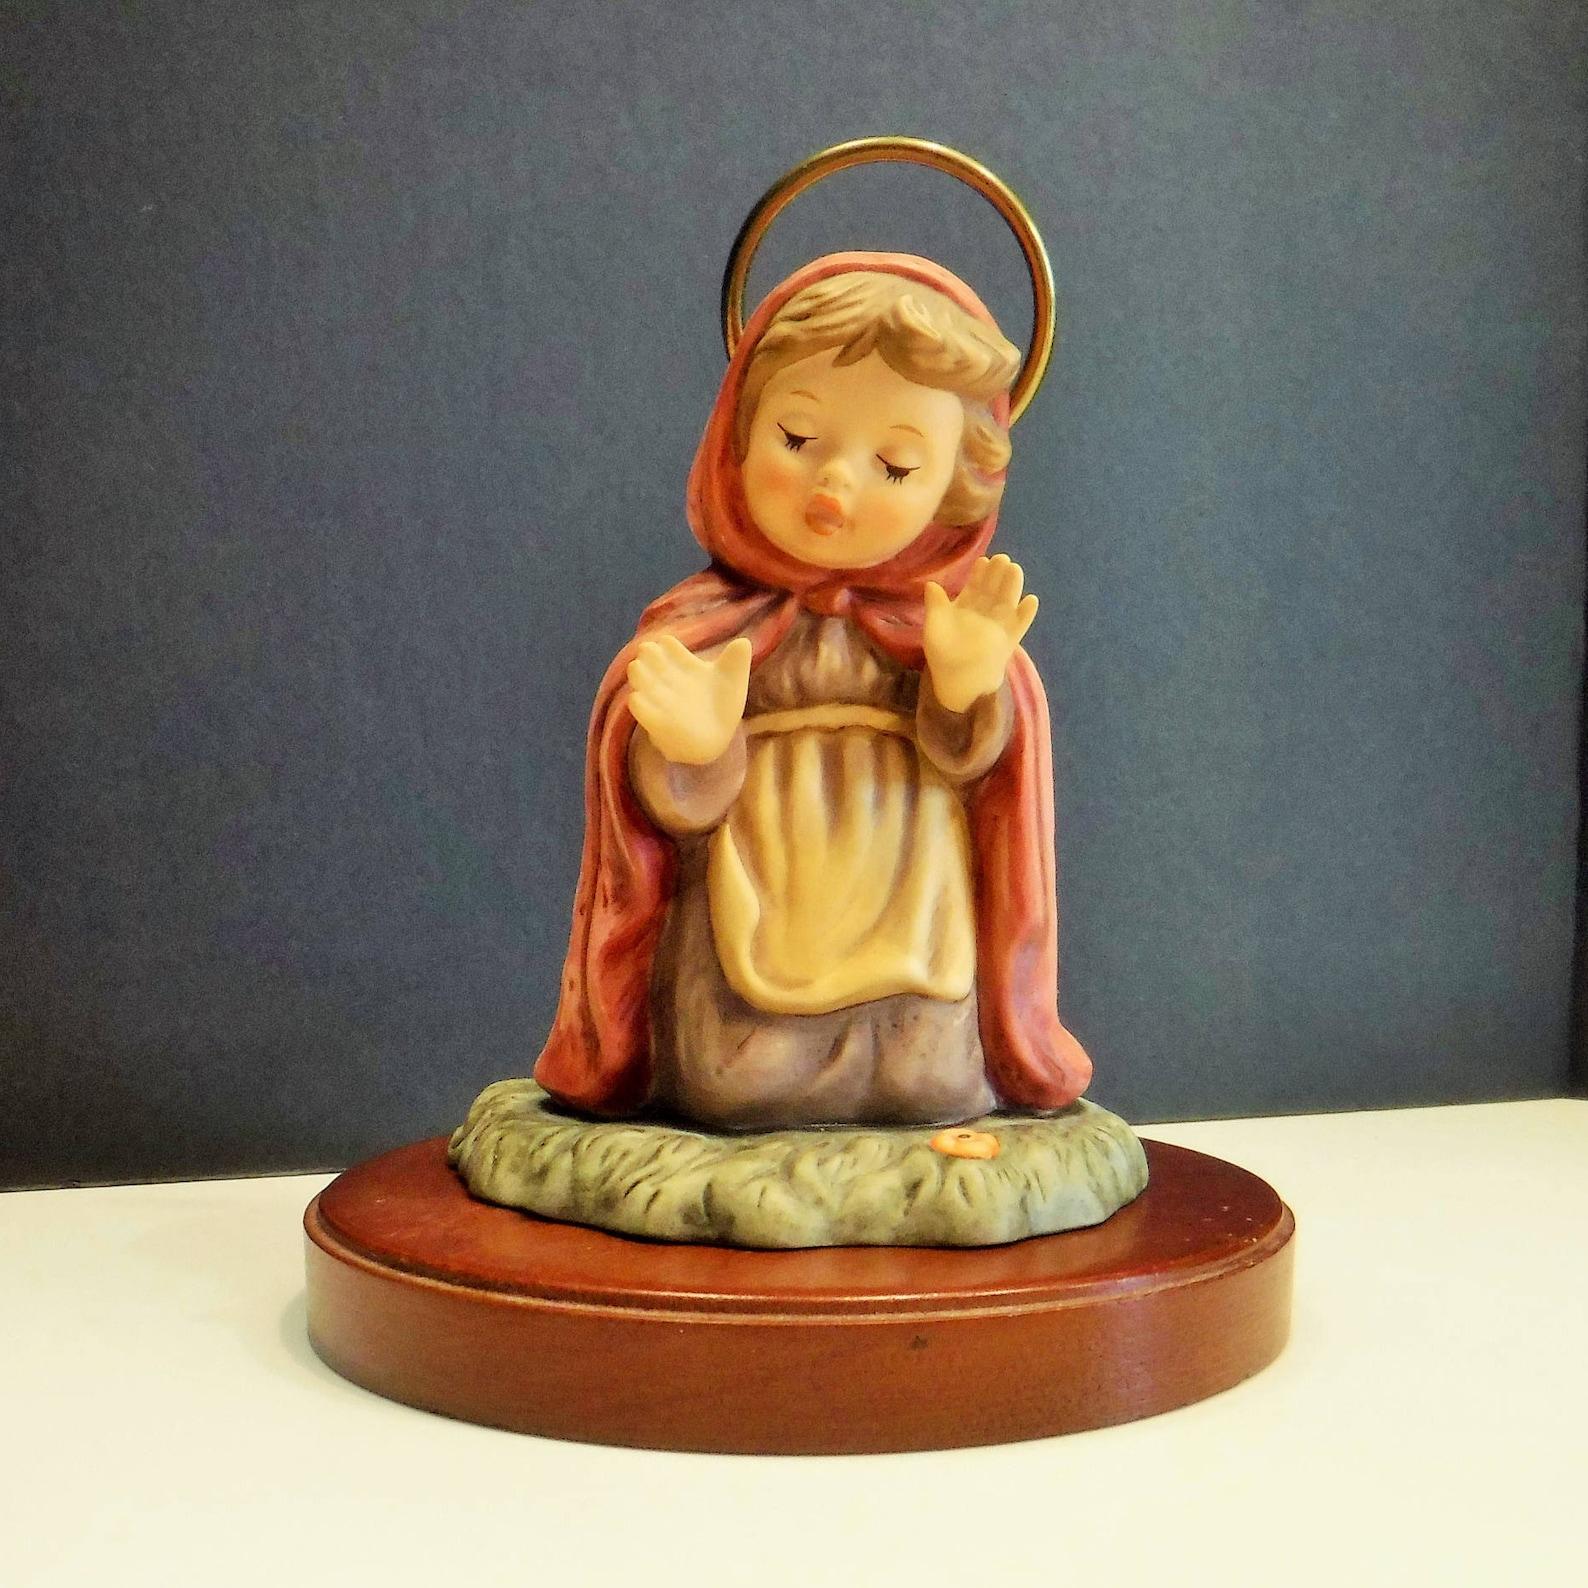 Nativity Mary Goebel Berta Hummel Nativity Mary, Mary Hummel Nativity piece, Replacement Mary for Goebel Nativity Set, Porcelain Mary